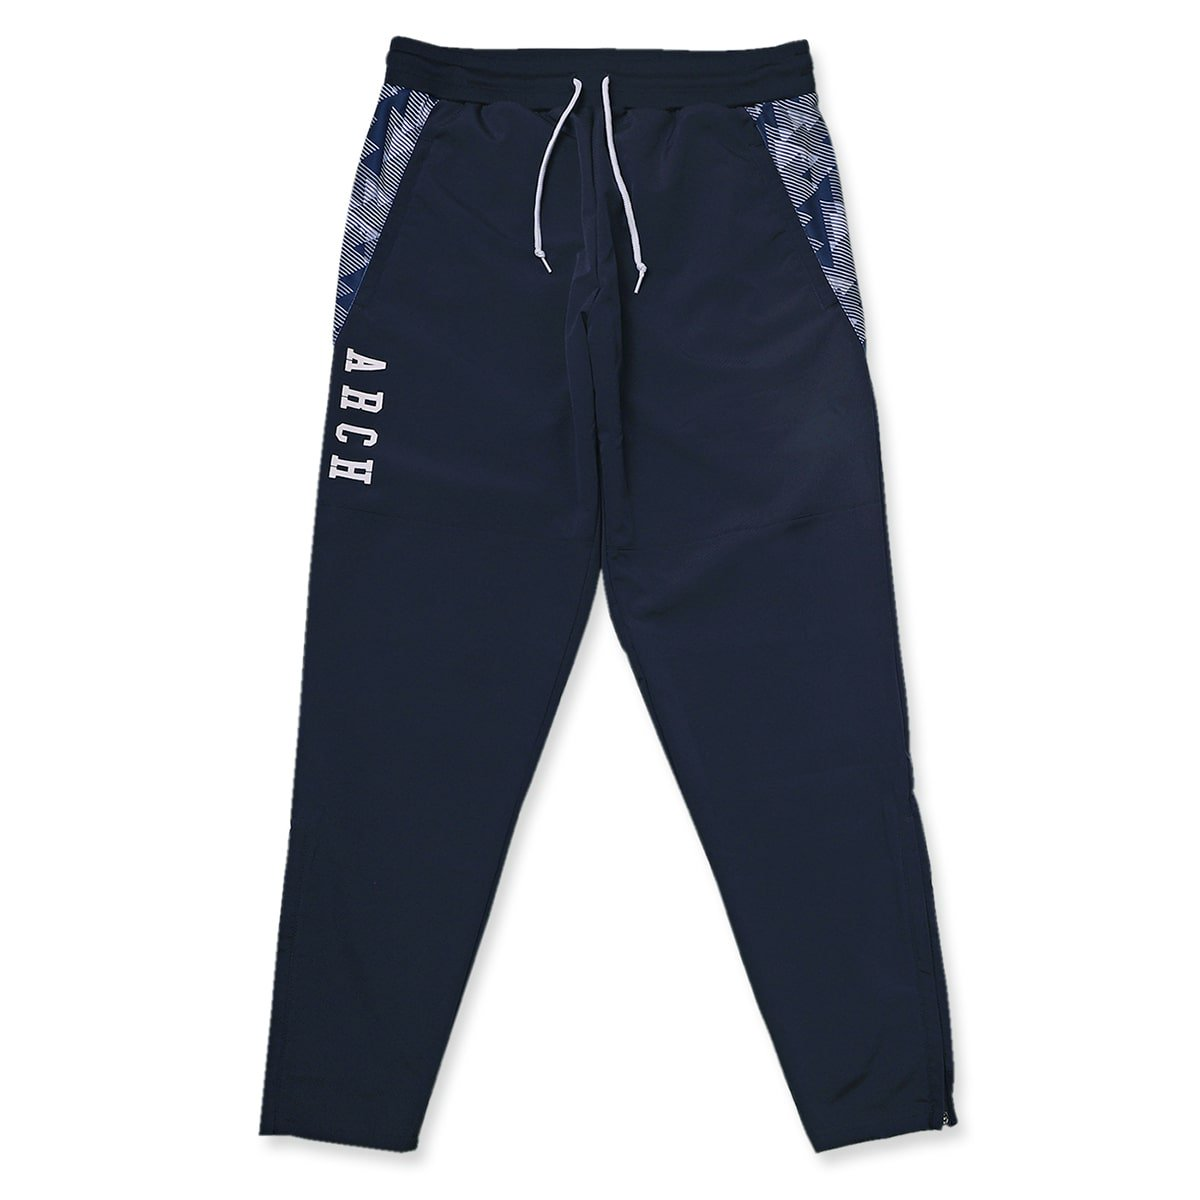 triangle native warmup pants【navy】